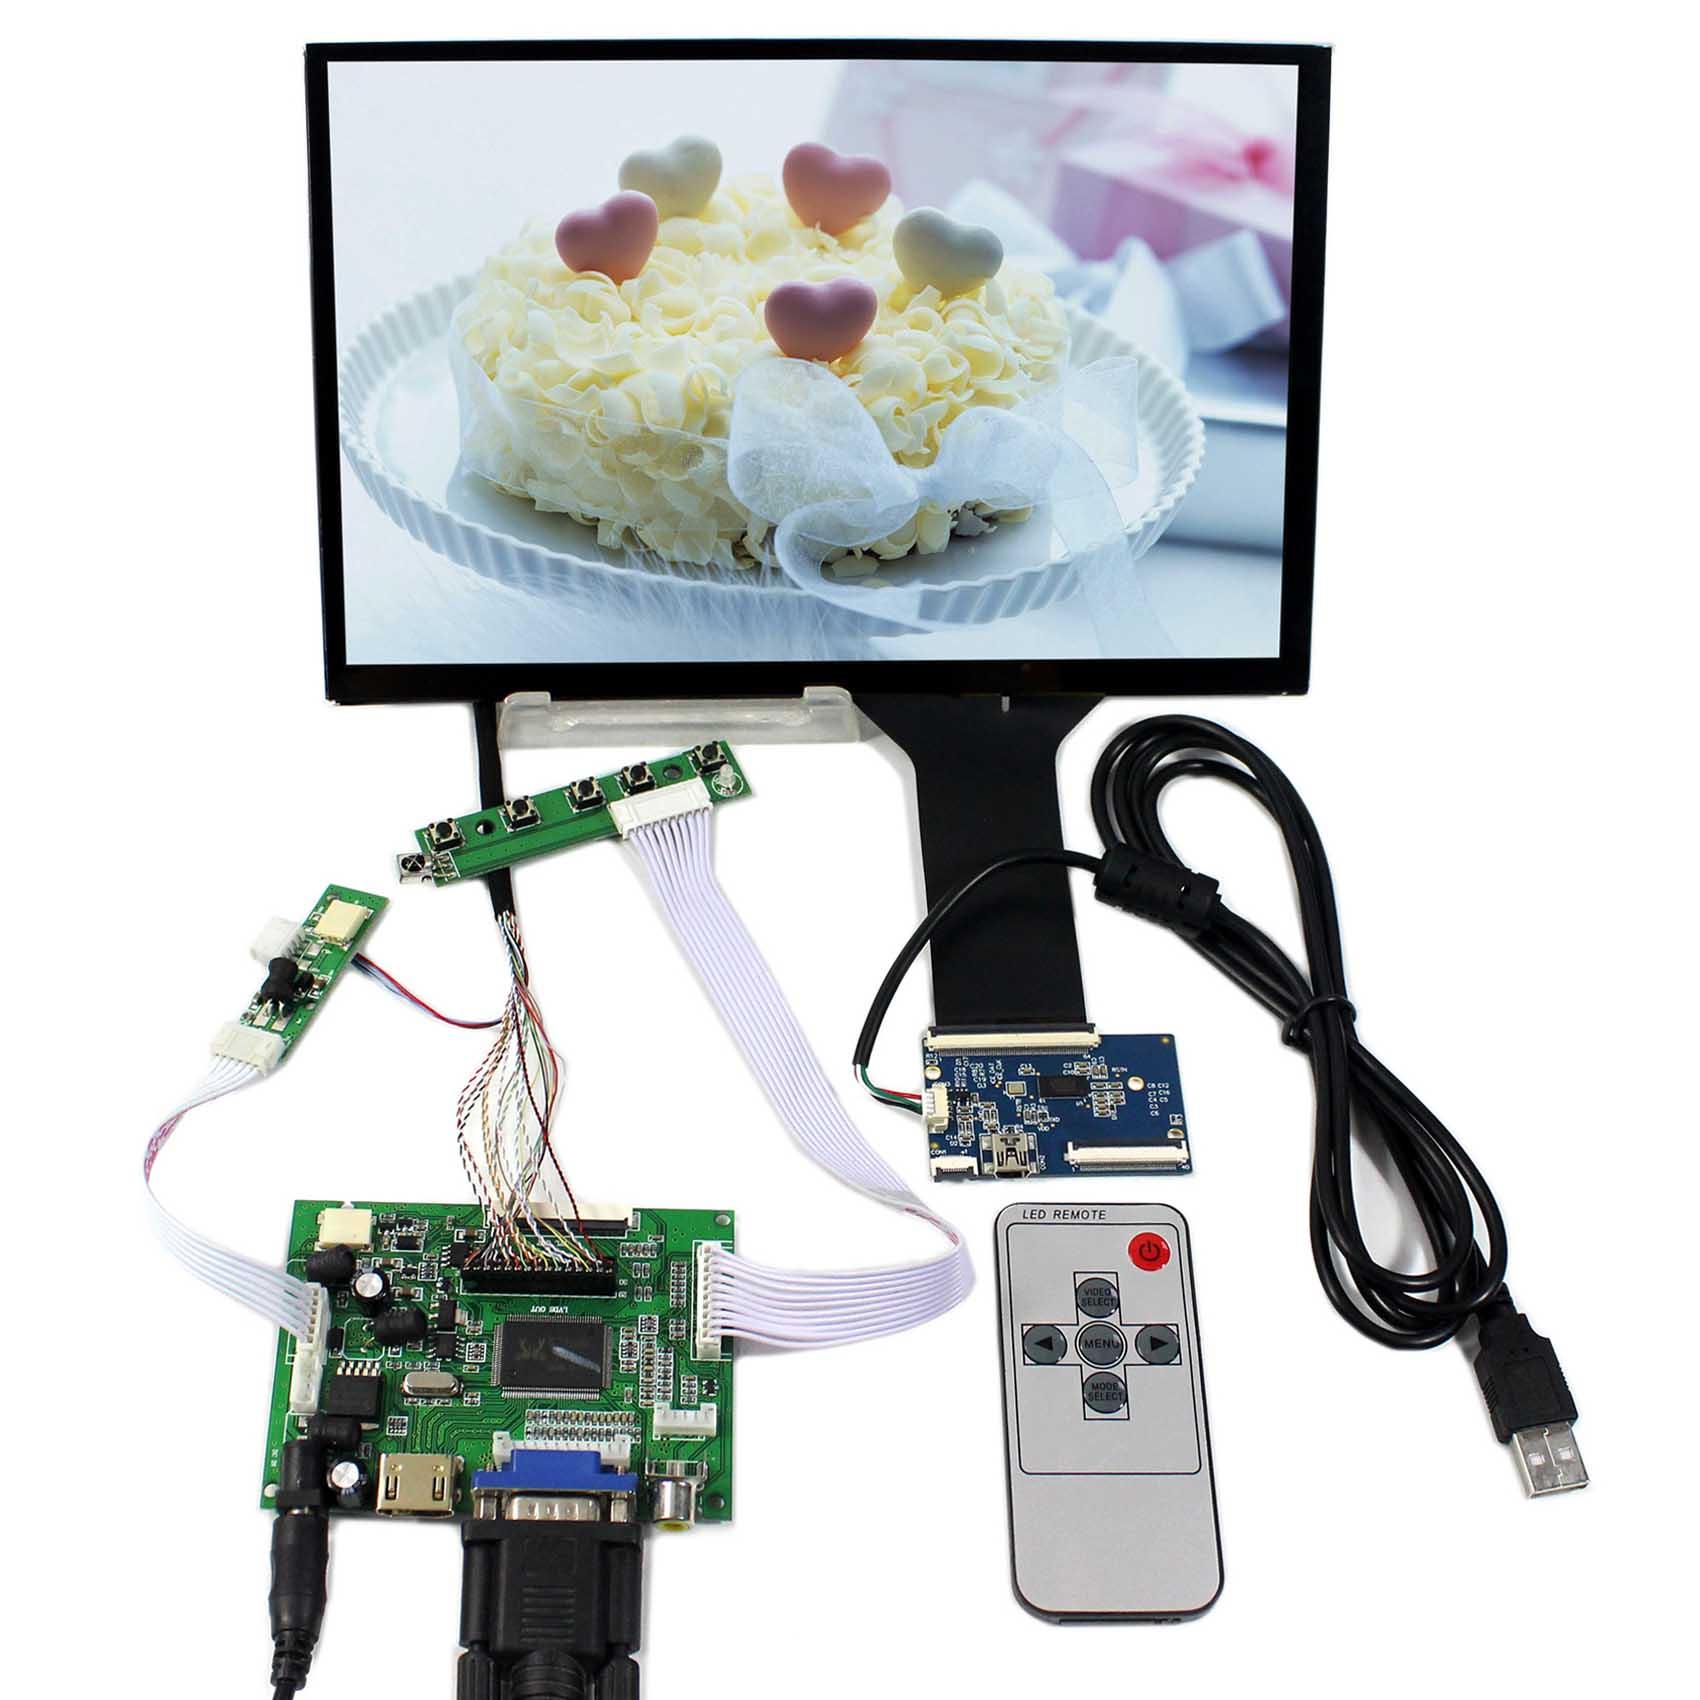 HDMI VGA 2AV LCD Controller Board With 10.1inch 1920x1200 B101UAN02.1 AHAV LCD ScreenHDMI VGA 2AV LCD Controller Board With 10.1inch 1920x1200 B101UAN02.1 AHAV LCD Screen